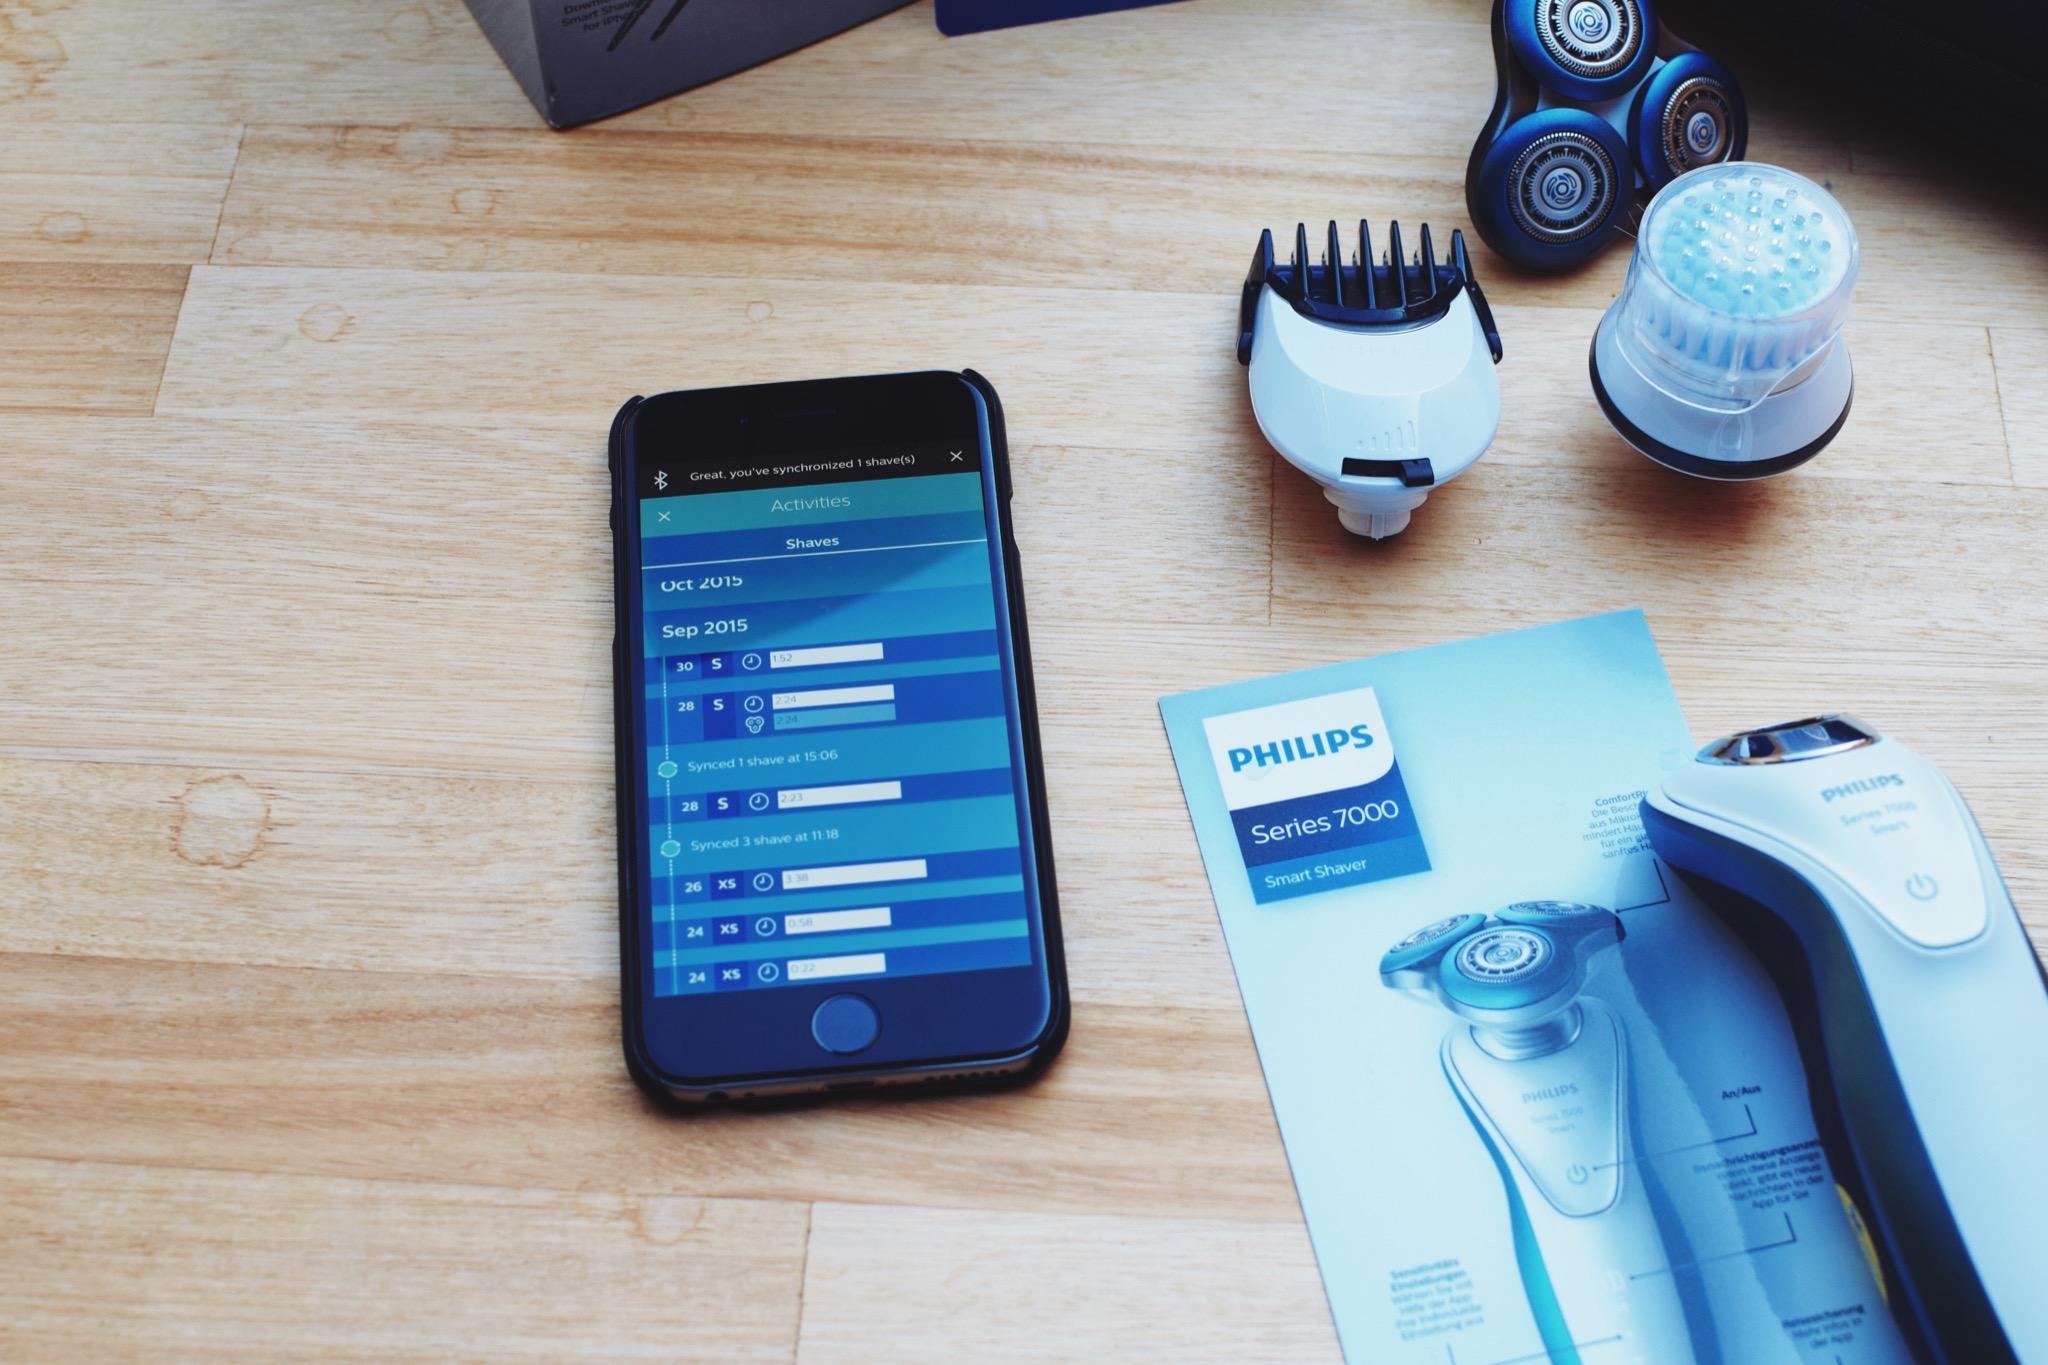 Philips Smart Shaver Series 7000 3